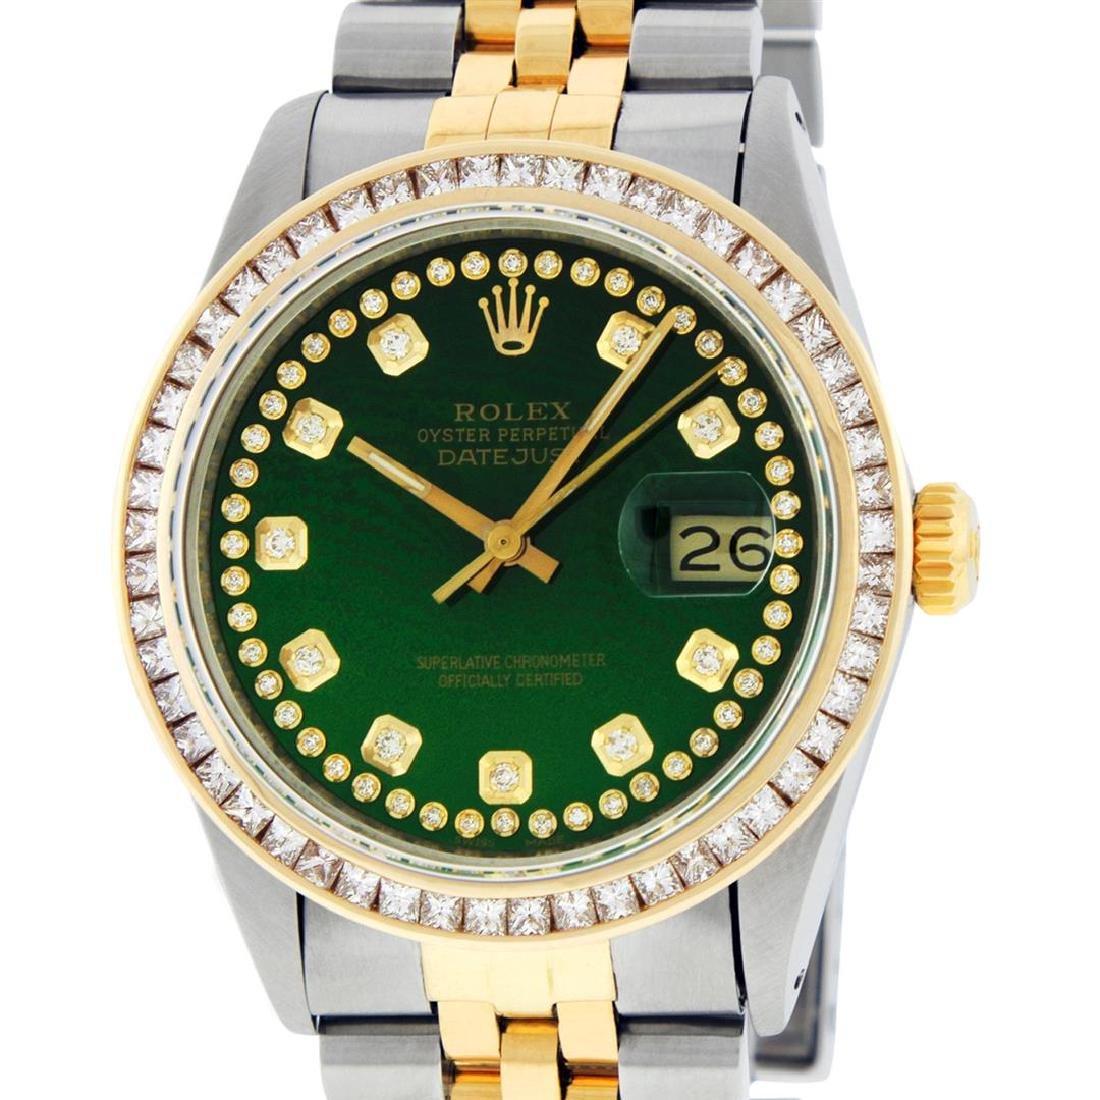 Rolex Men's Two Tone 14K Green Vignette Princess Cut